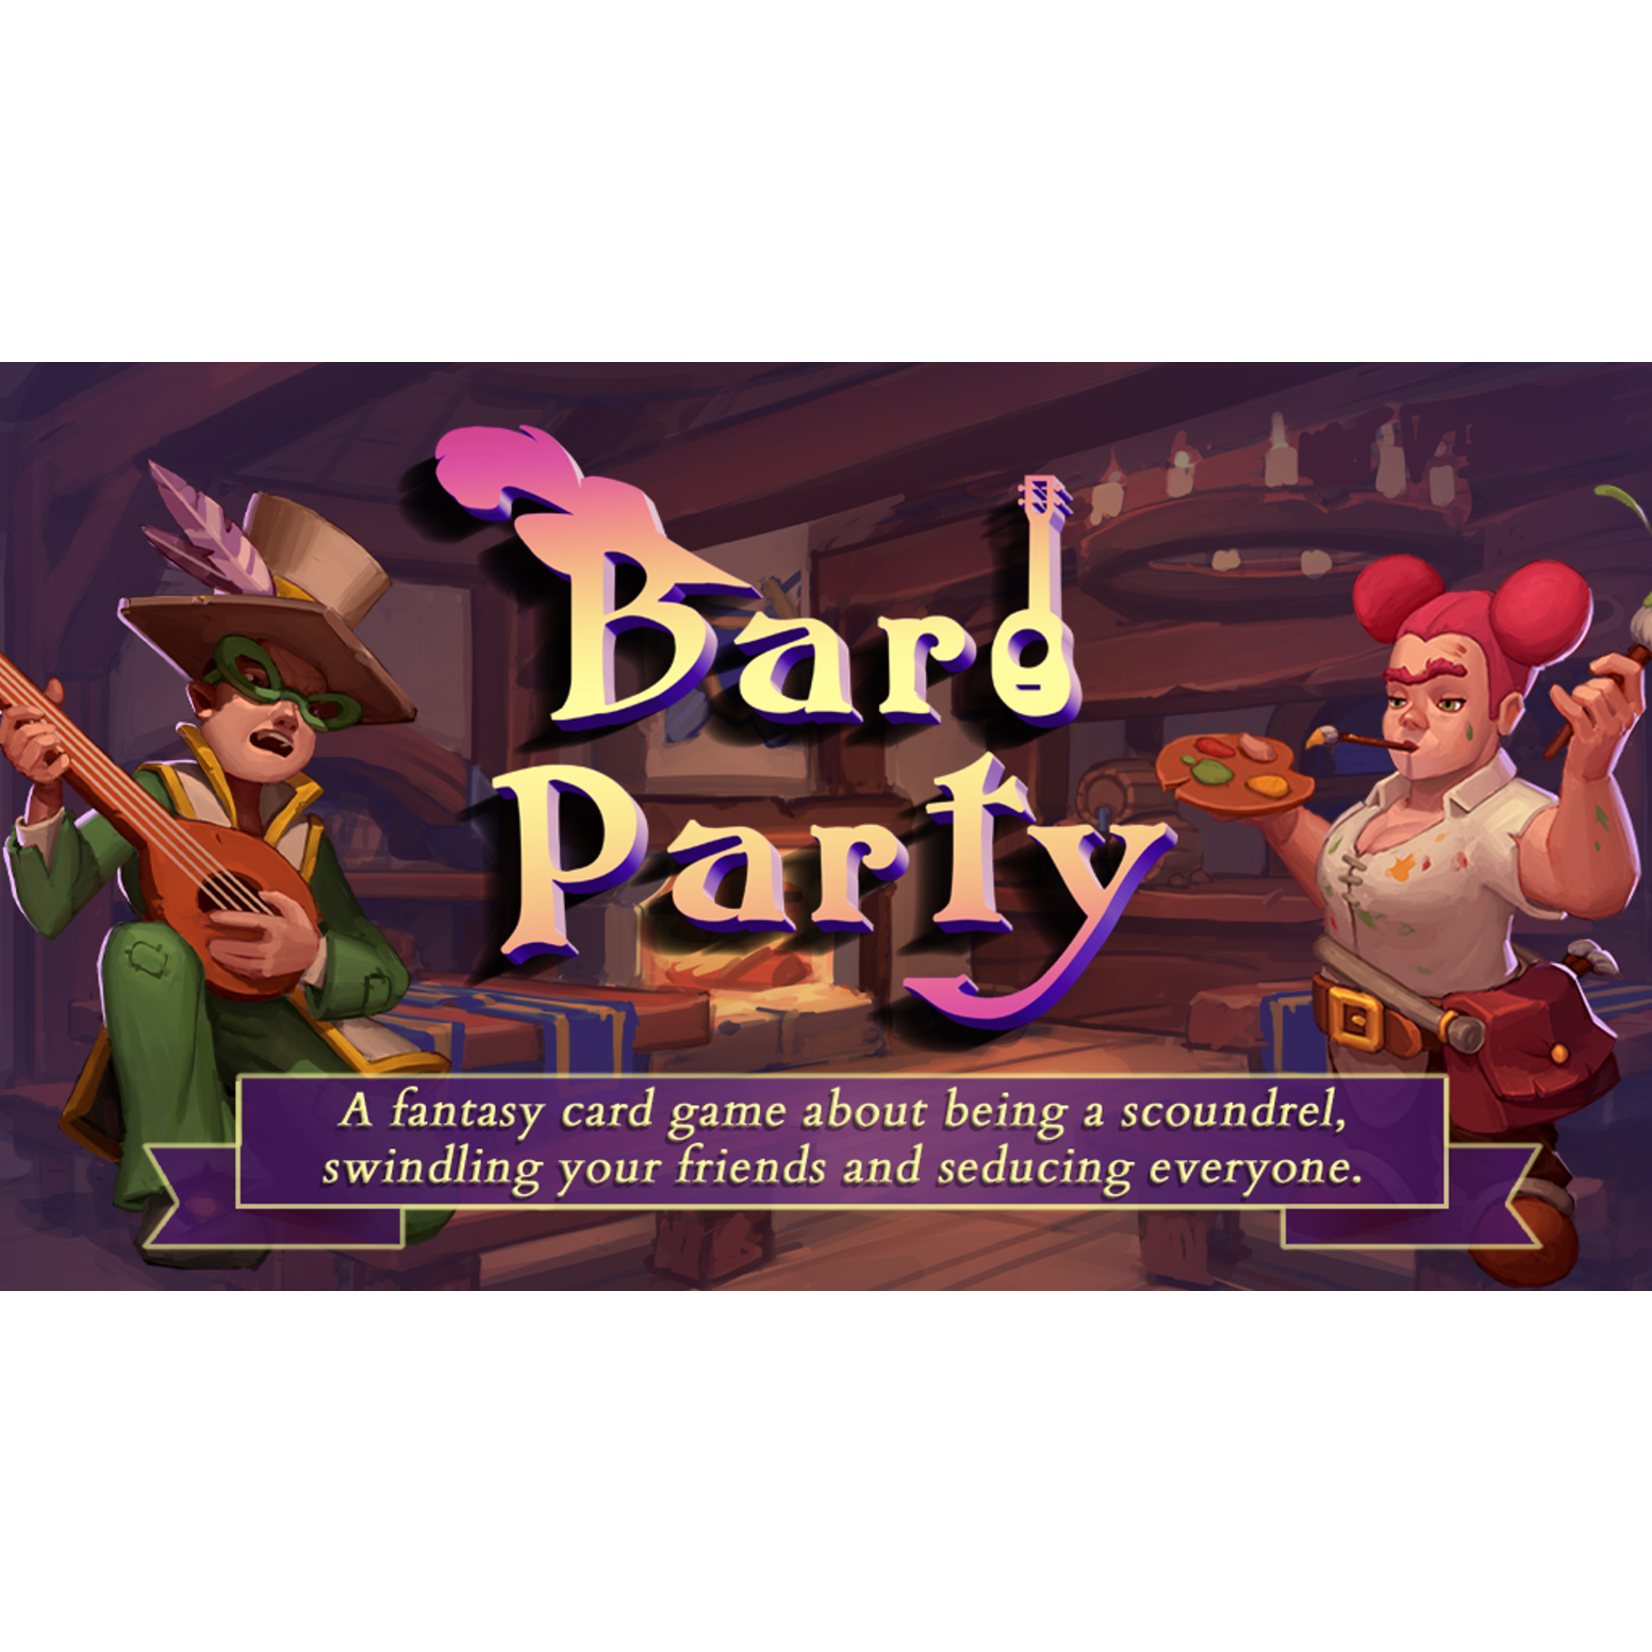 Wits & Giggles Gaming Bard Party KS